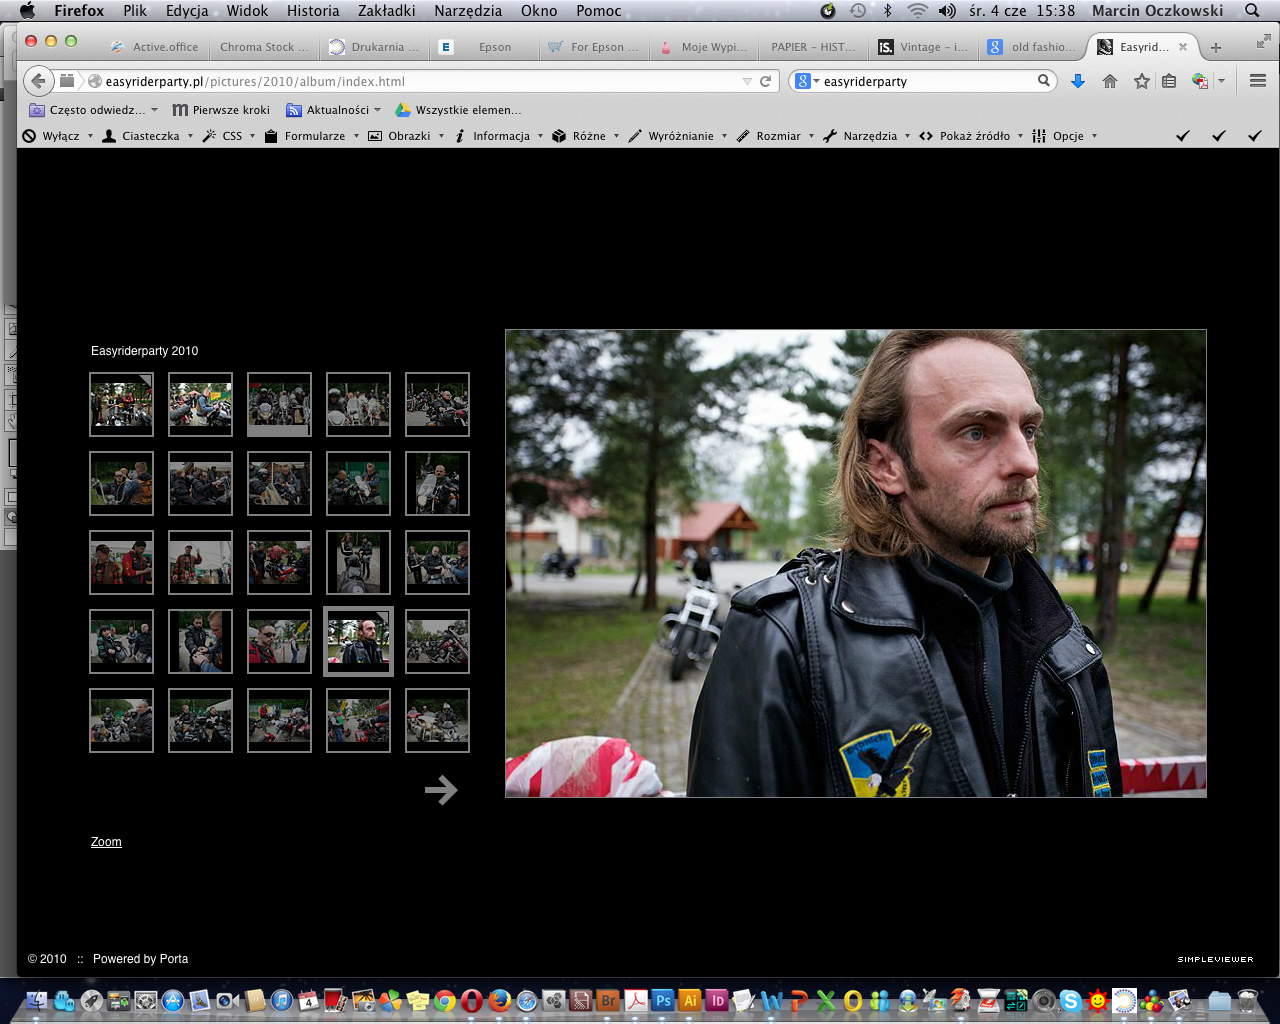 Zrzut ekranu 2014-06-4 o 15.38.25